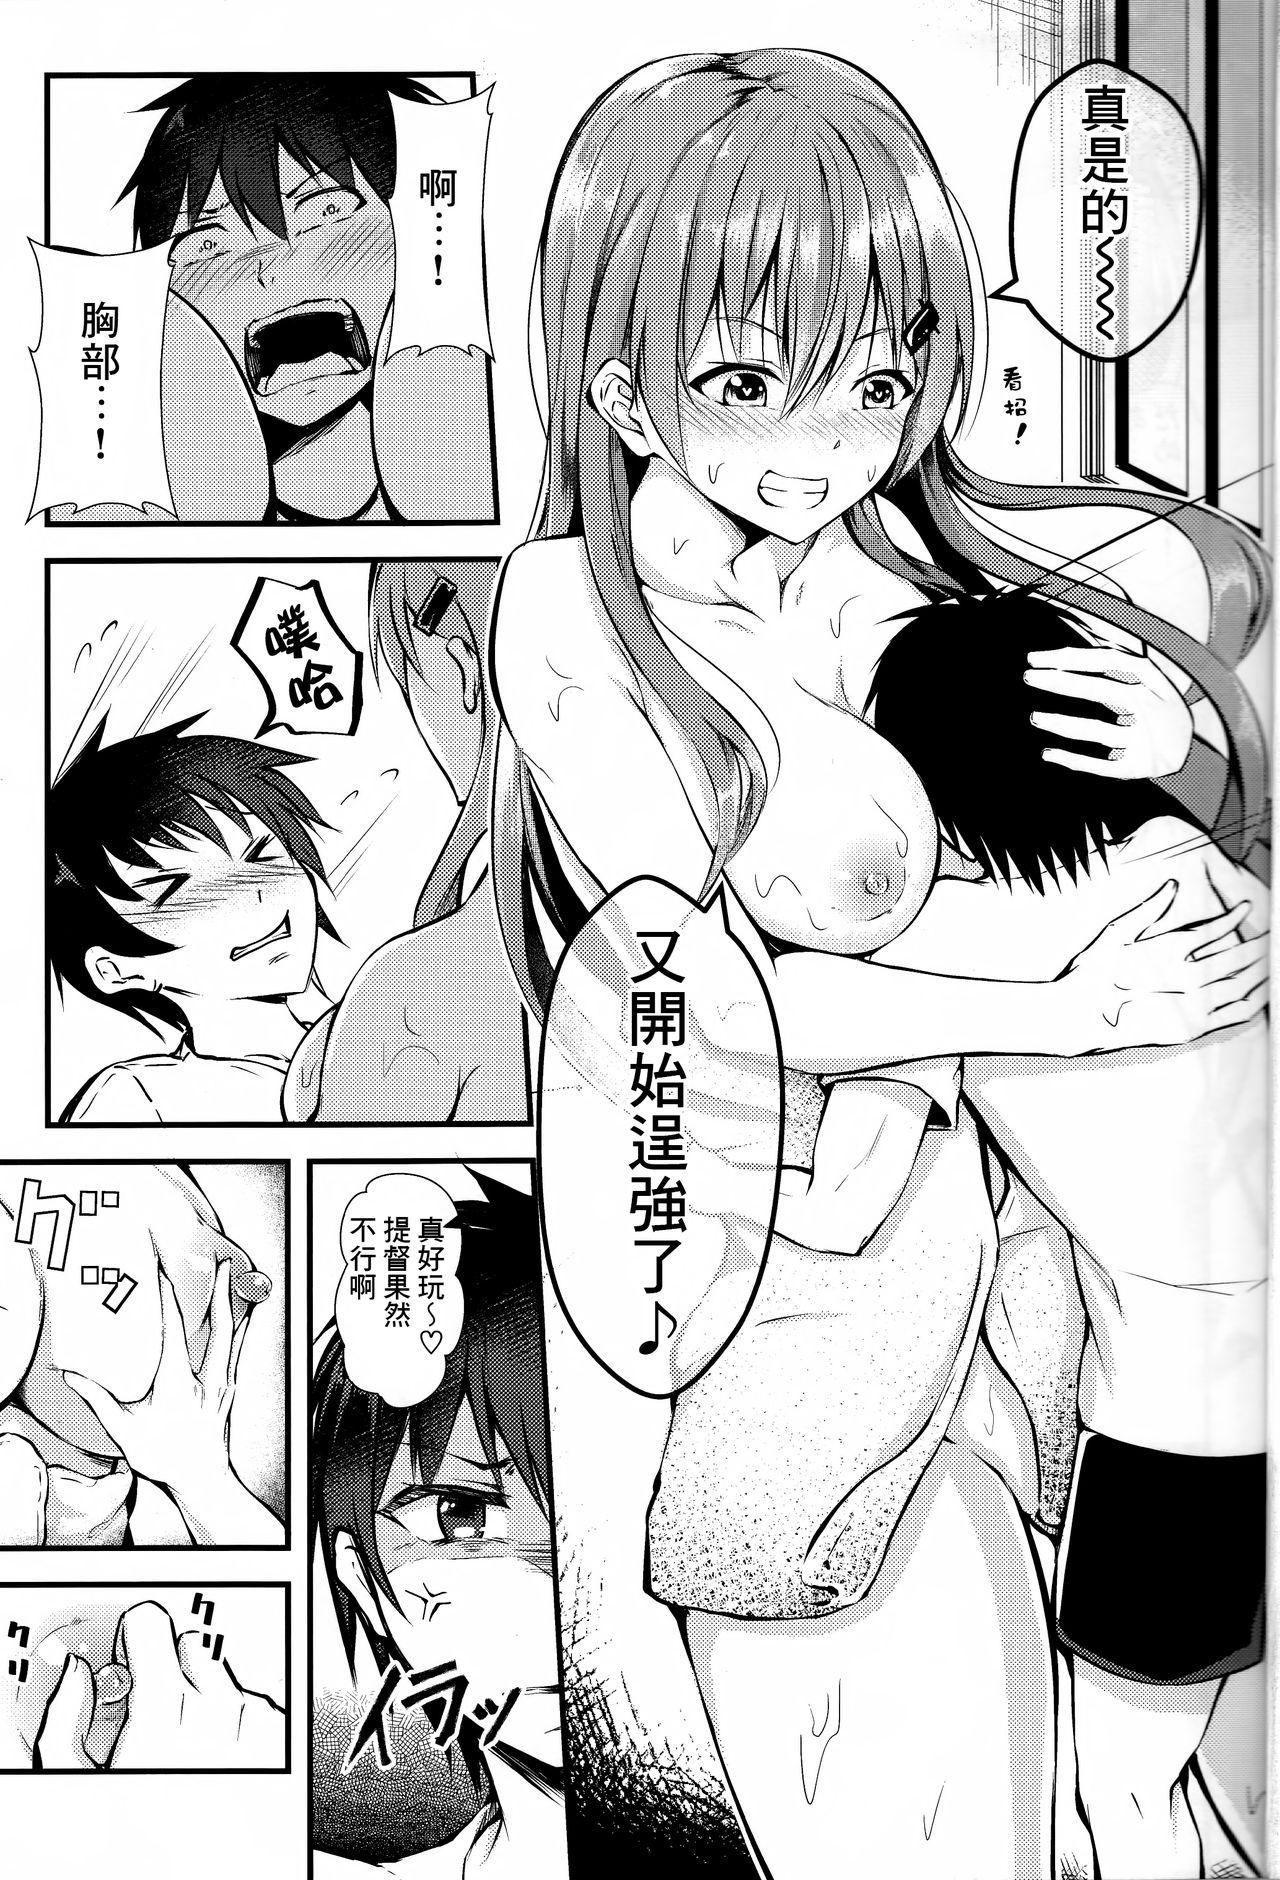 Suzuya wa Omakase 3